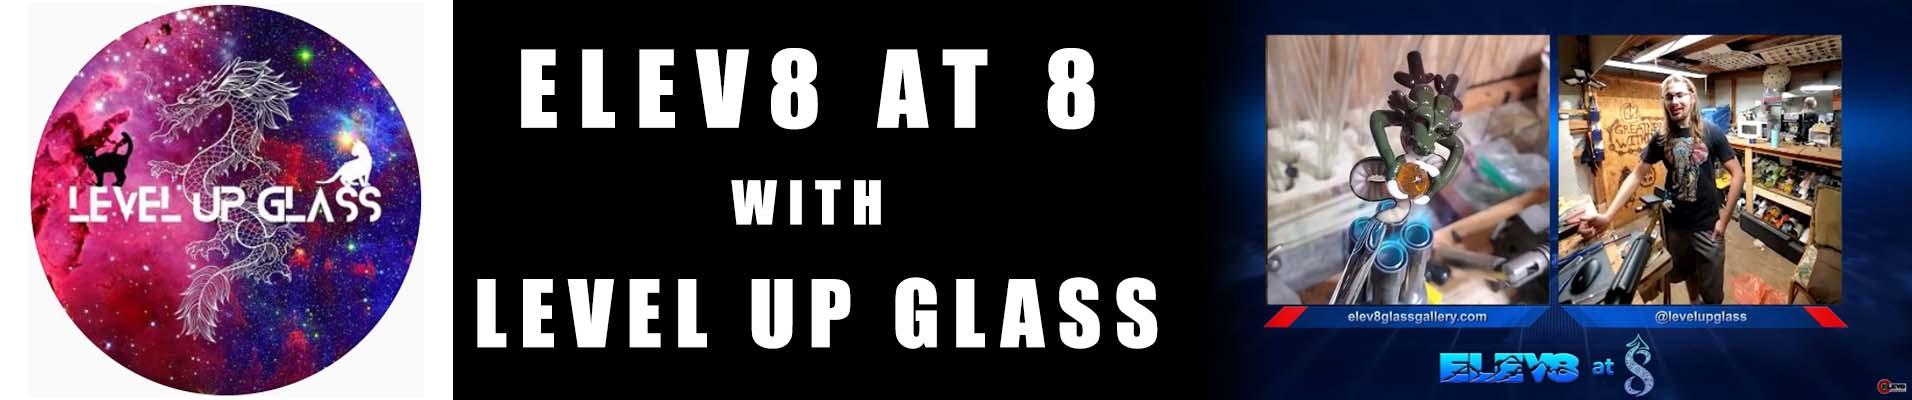 level-up-glass-elev8-at-8-banner.jpg